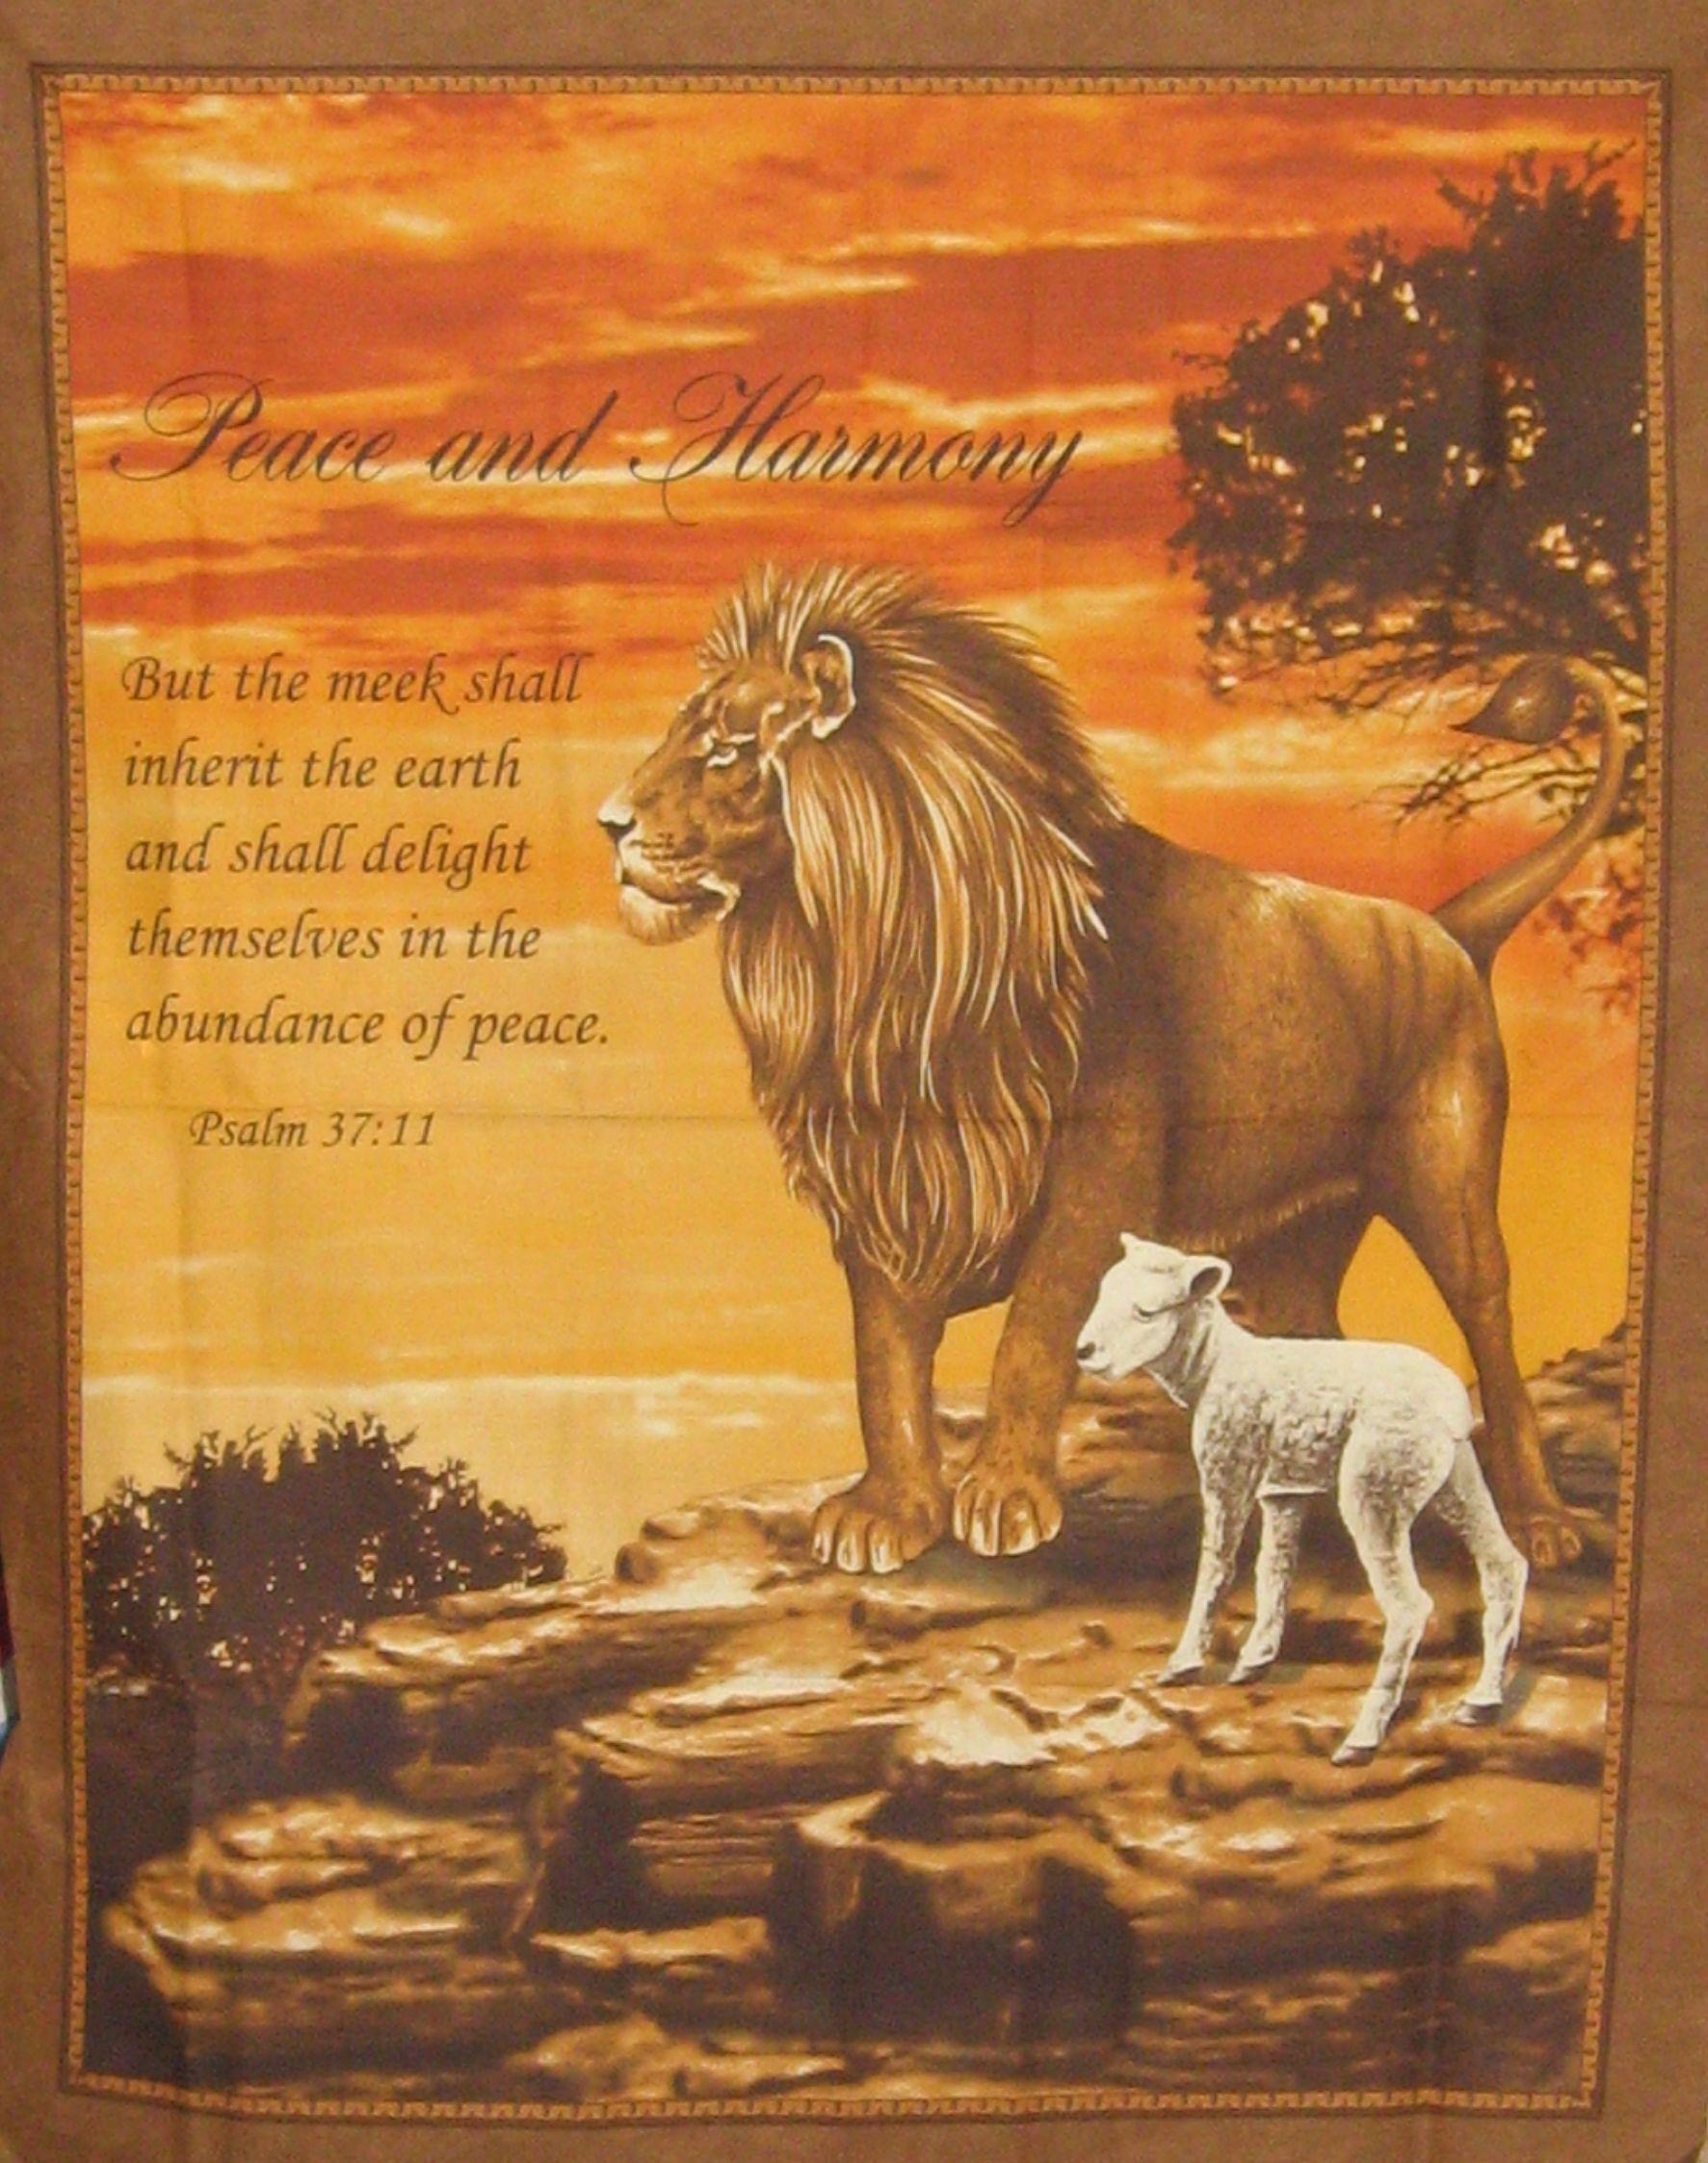 pics of lions and lambs | PEACE & HARMONY PSALM 37:11 LION & LAMB ...